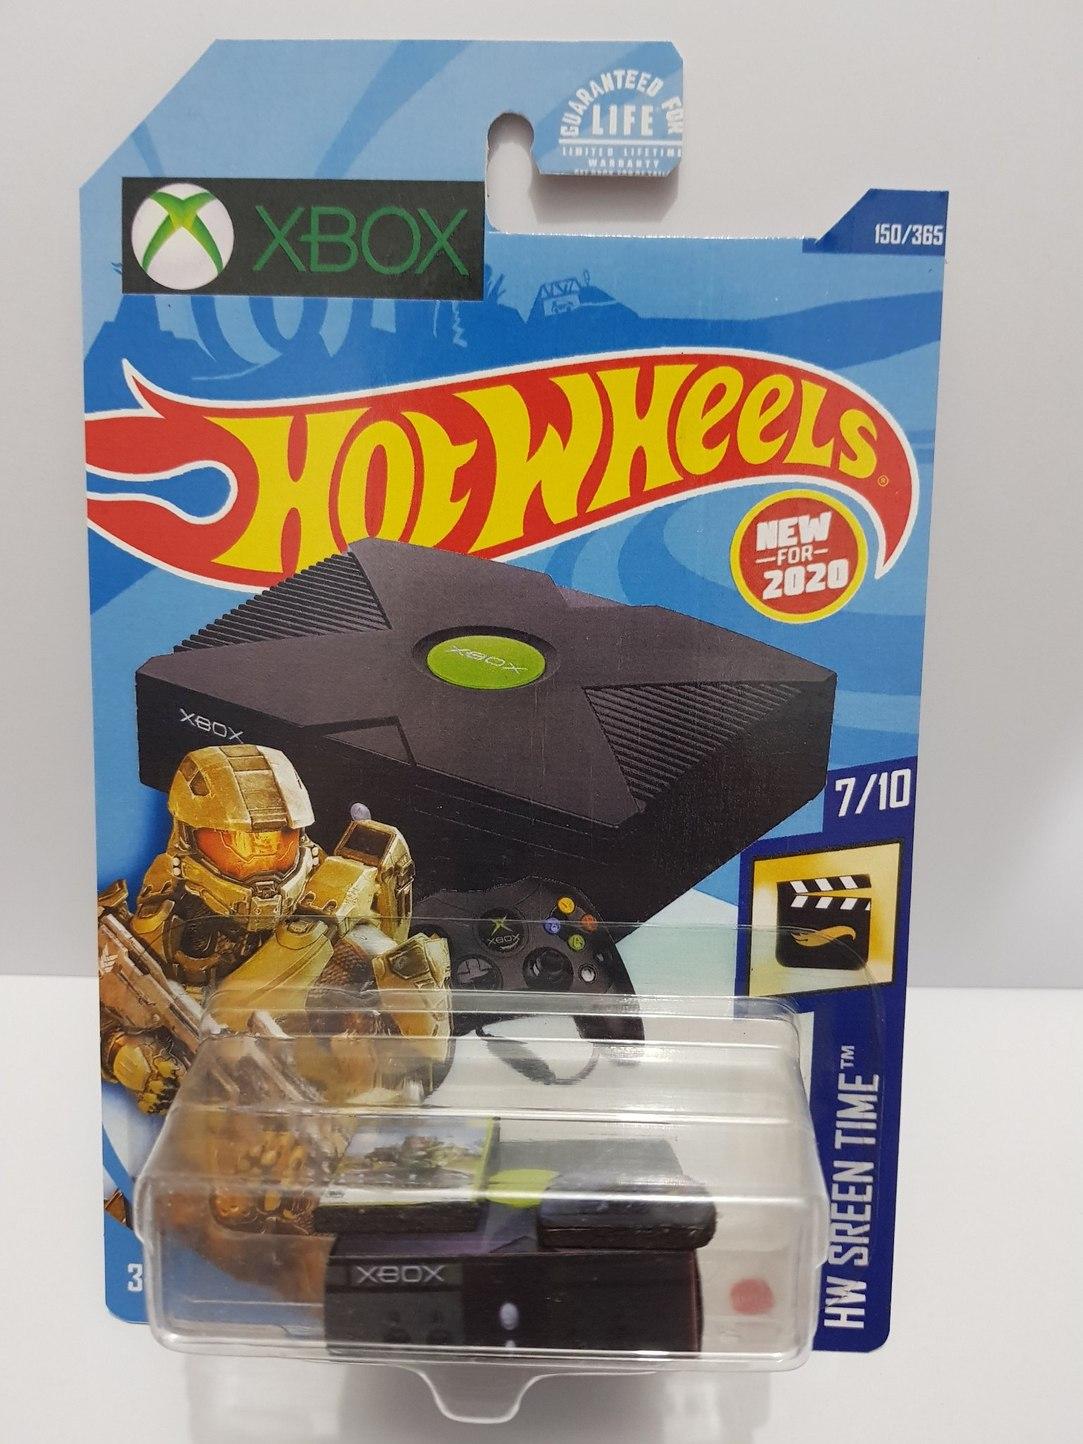 Xbox hotwheels - meme